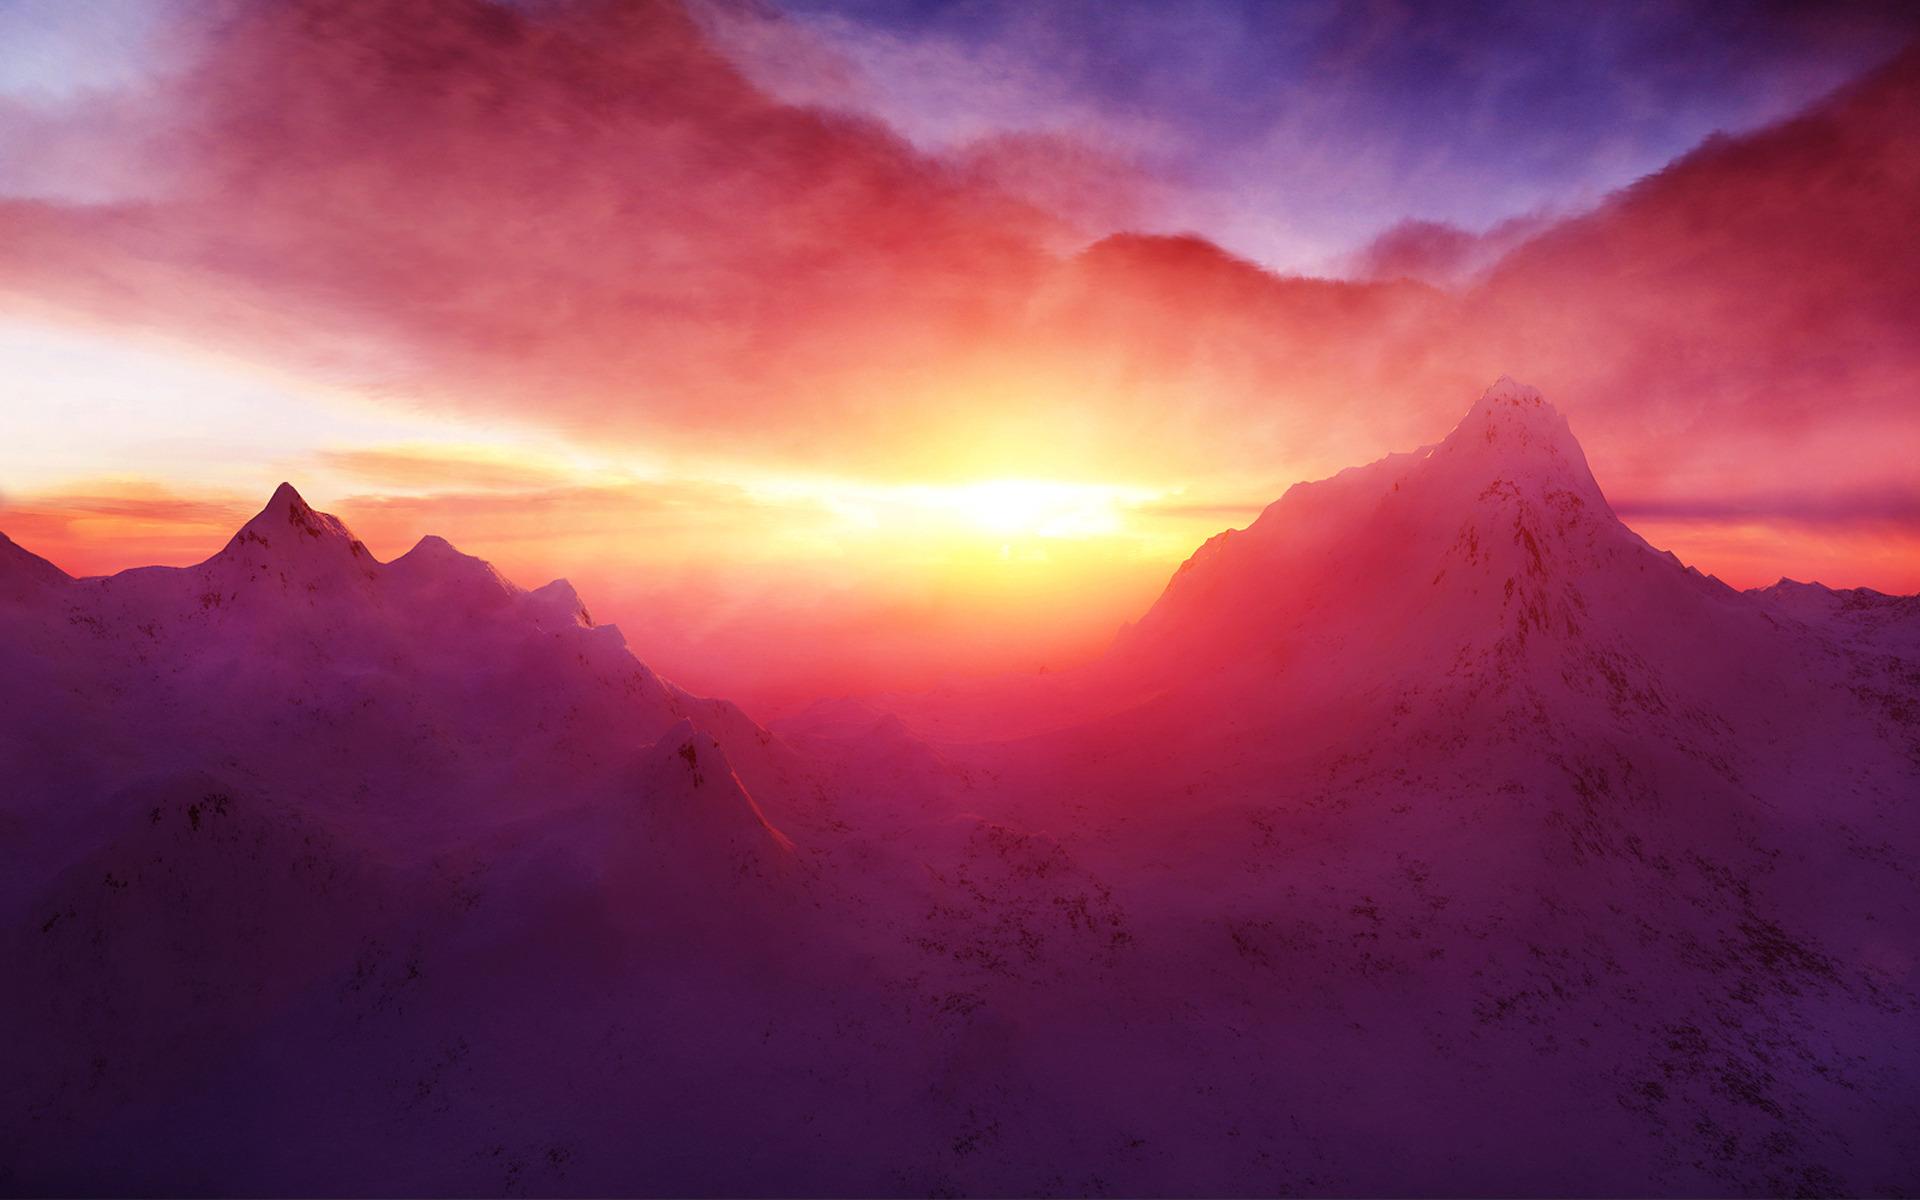 дымящие горы над закатом  № 2289025 без смс